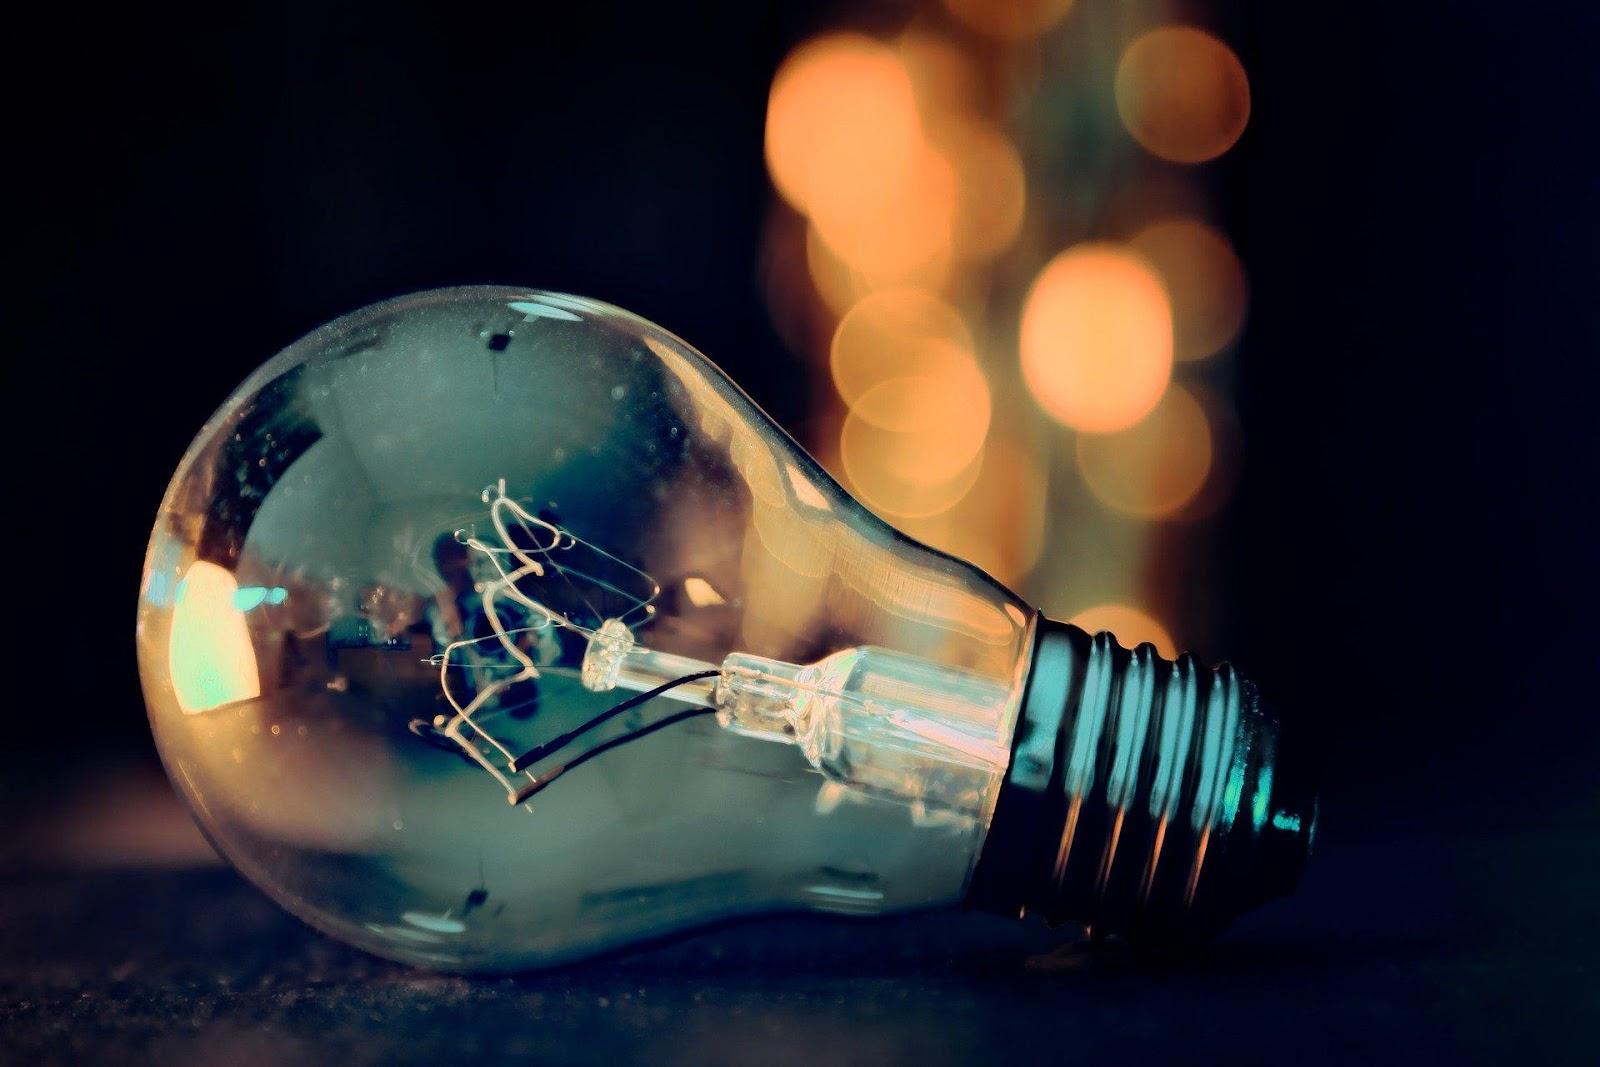 C:\Users\petar\Downloads\light-bulb-3535435_1920.jpg